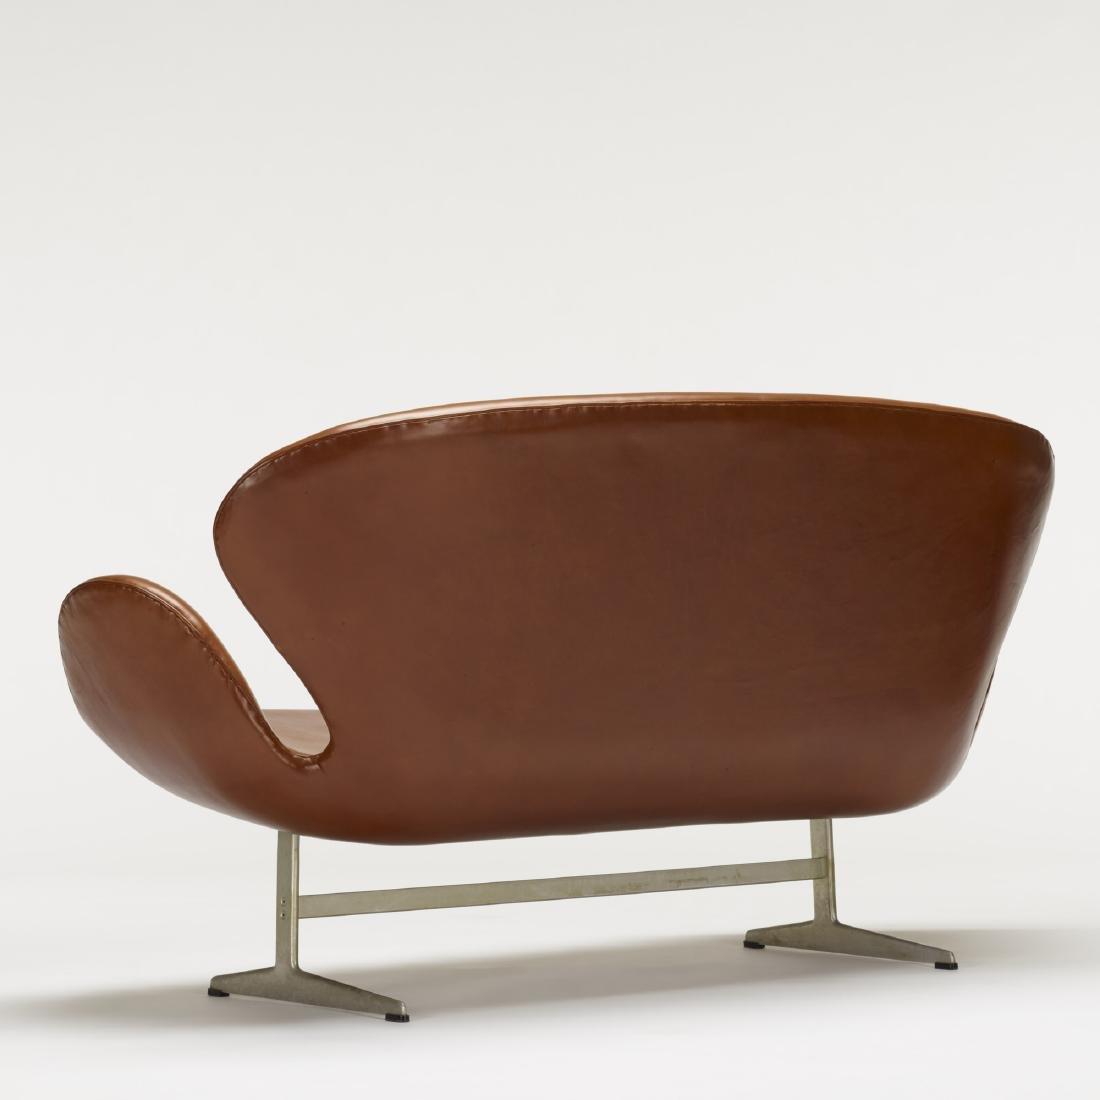 Arne Jacobsen, Swan settee, model 3321 - 4